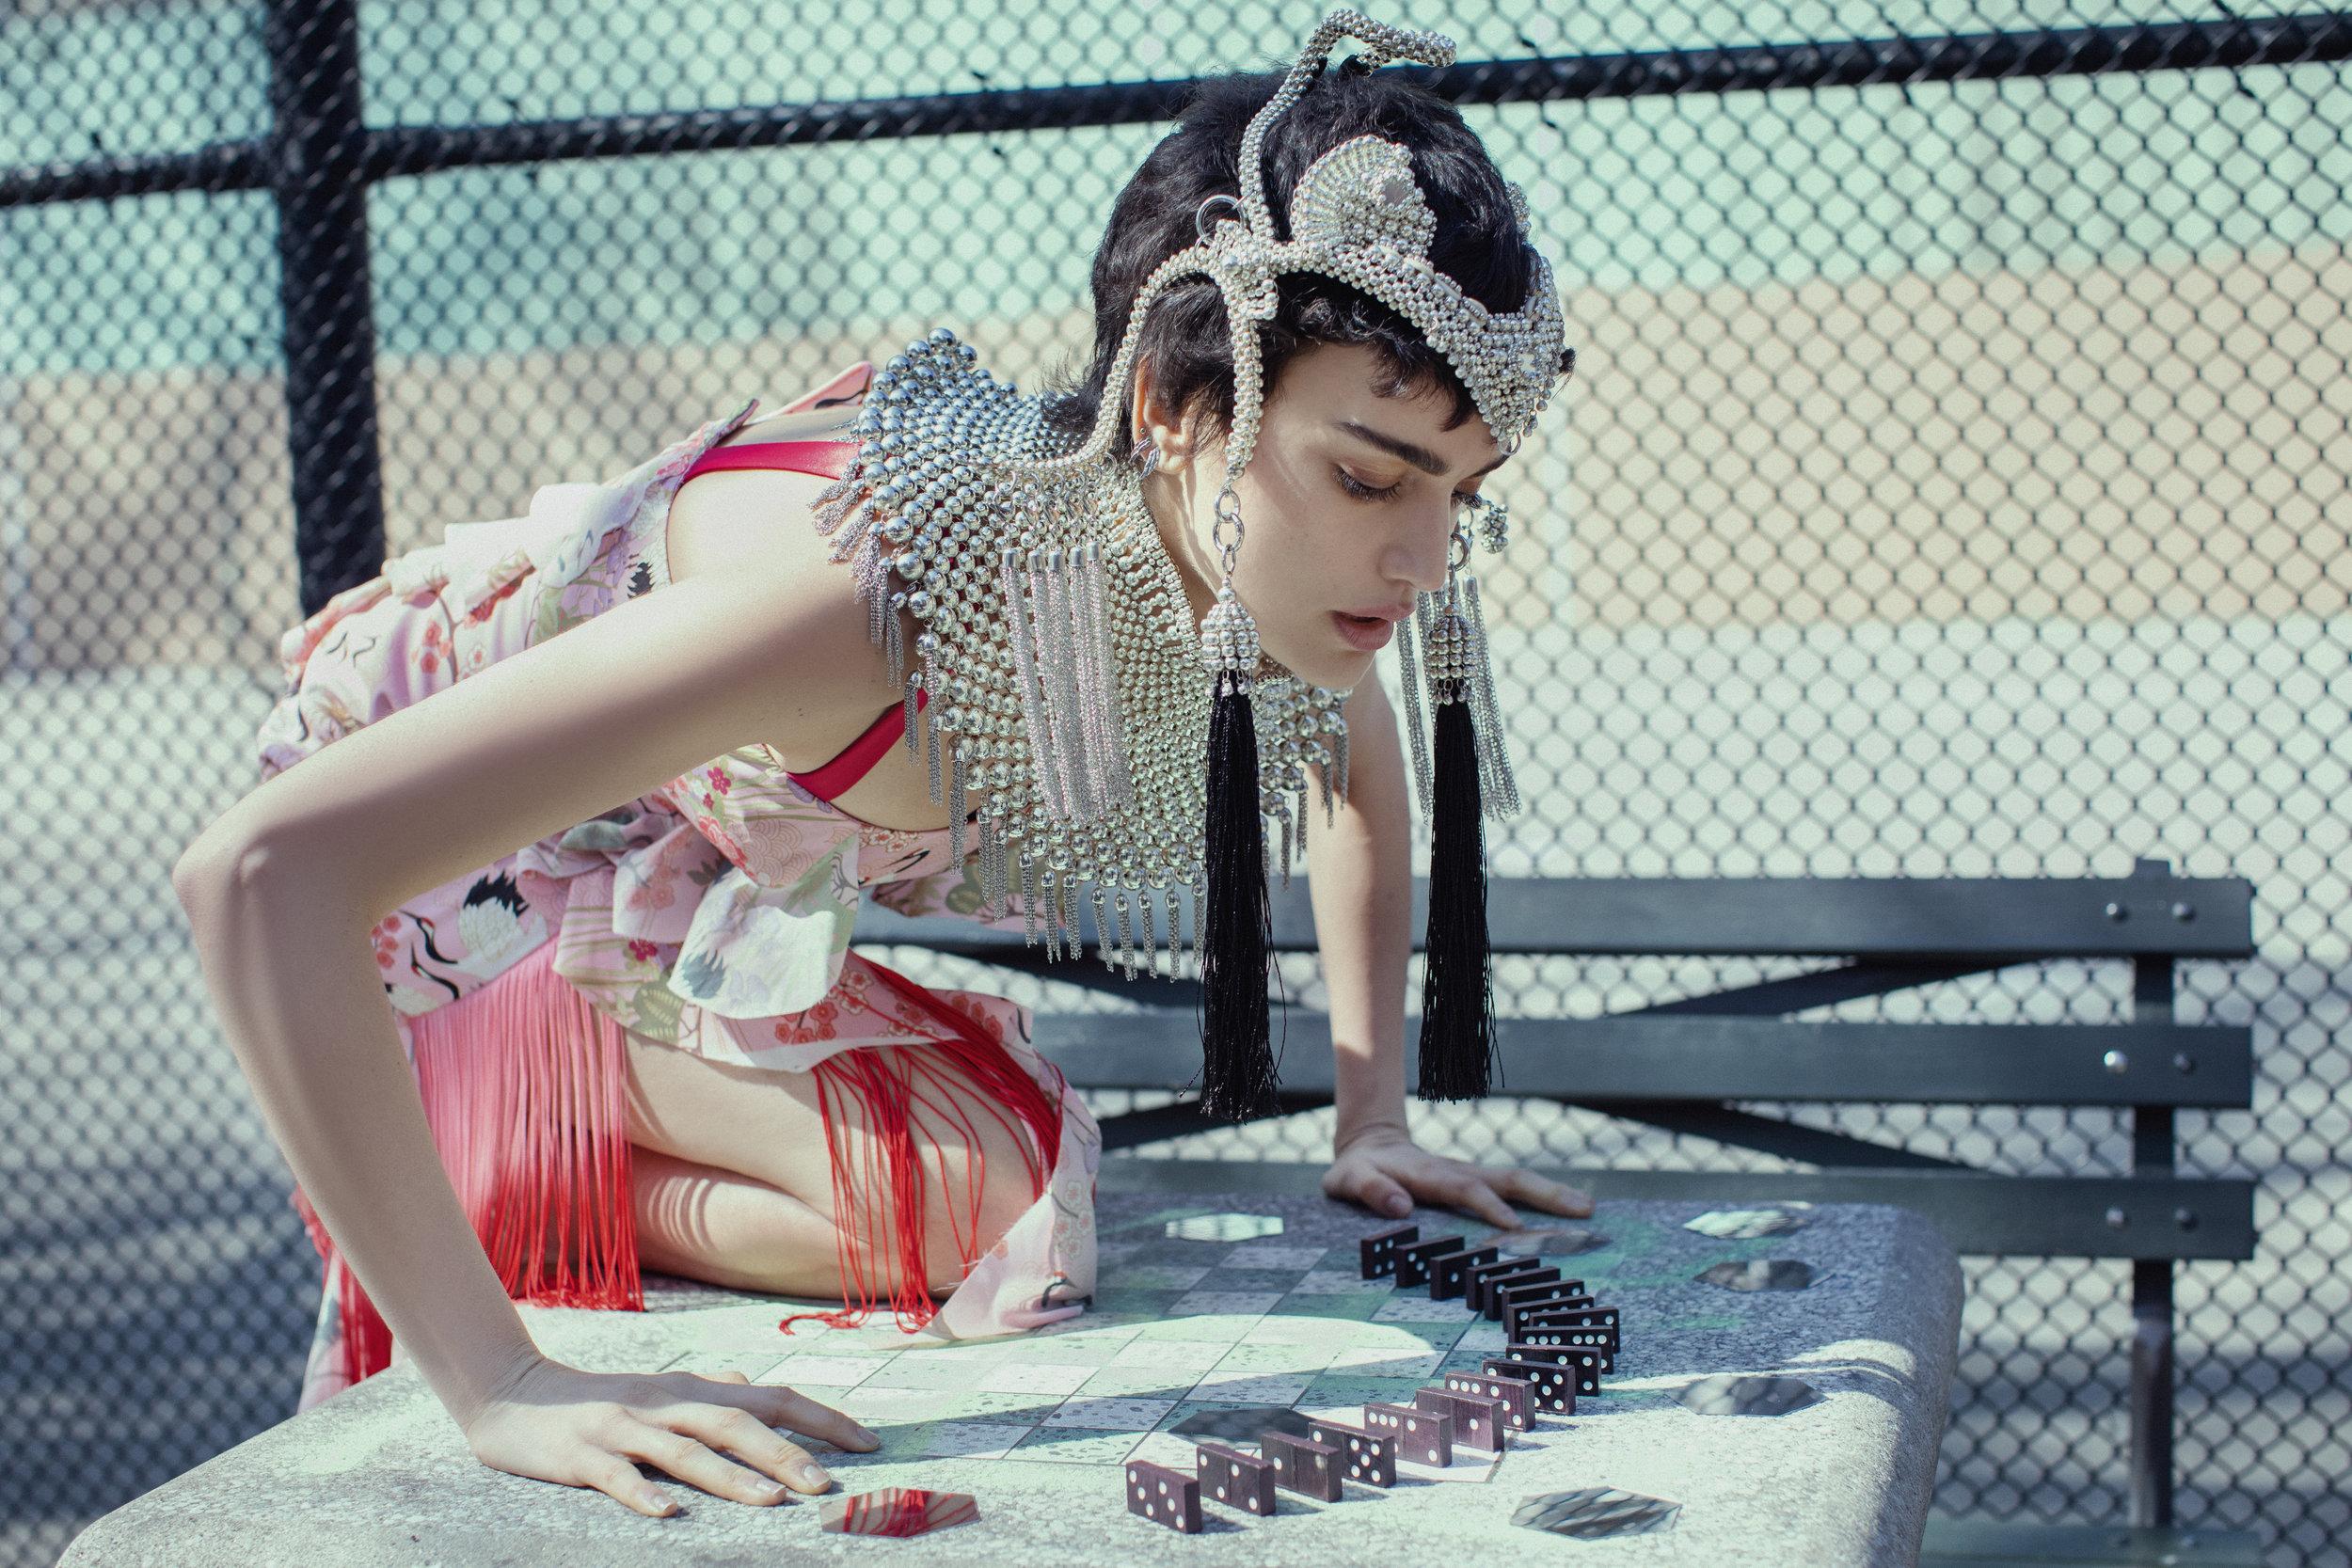 Dress VIDEMUS OMNIA. Collar and headpiece OBJECT & DAWN